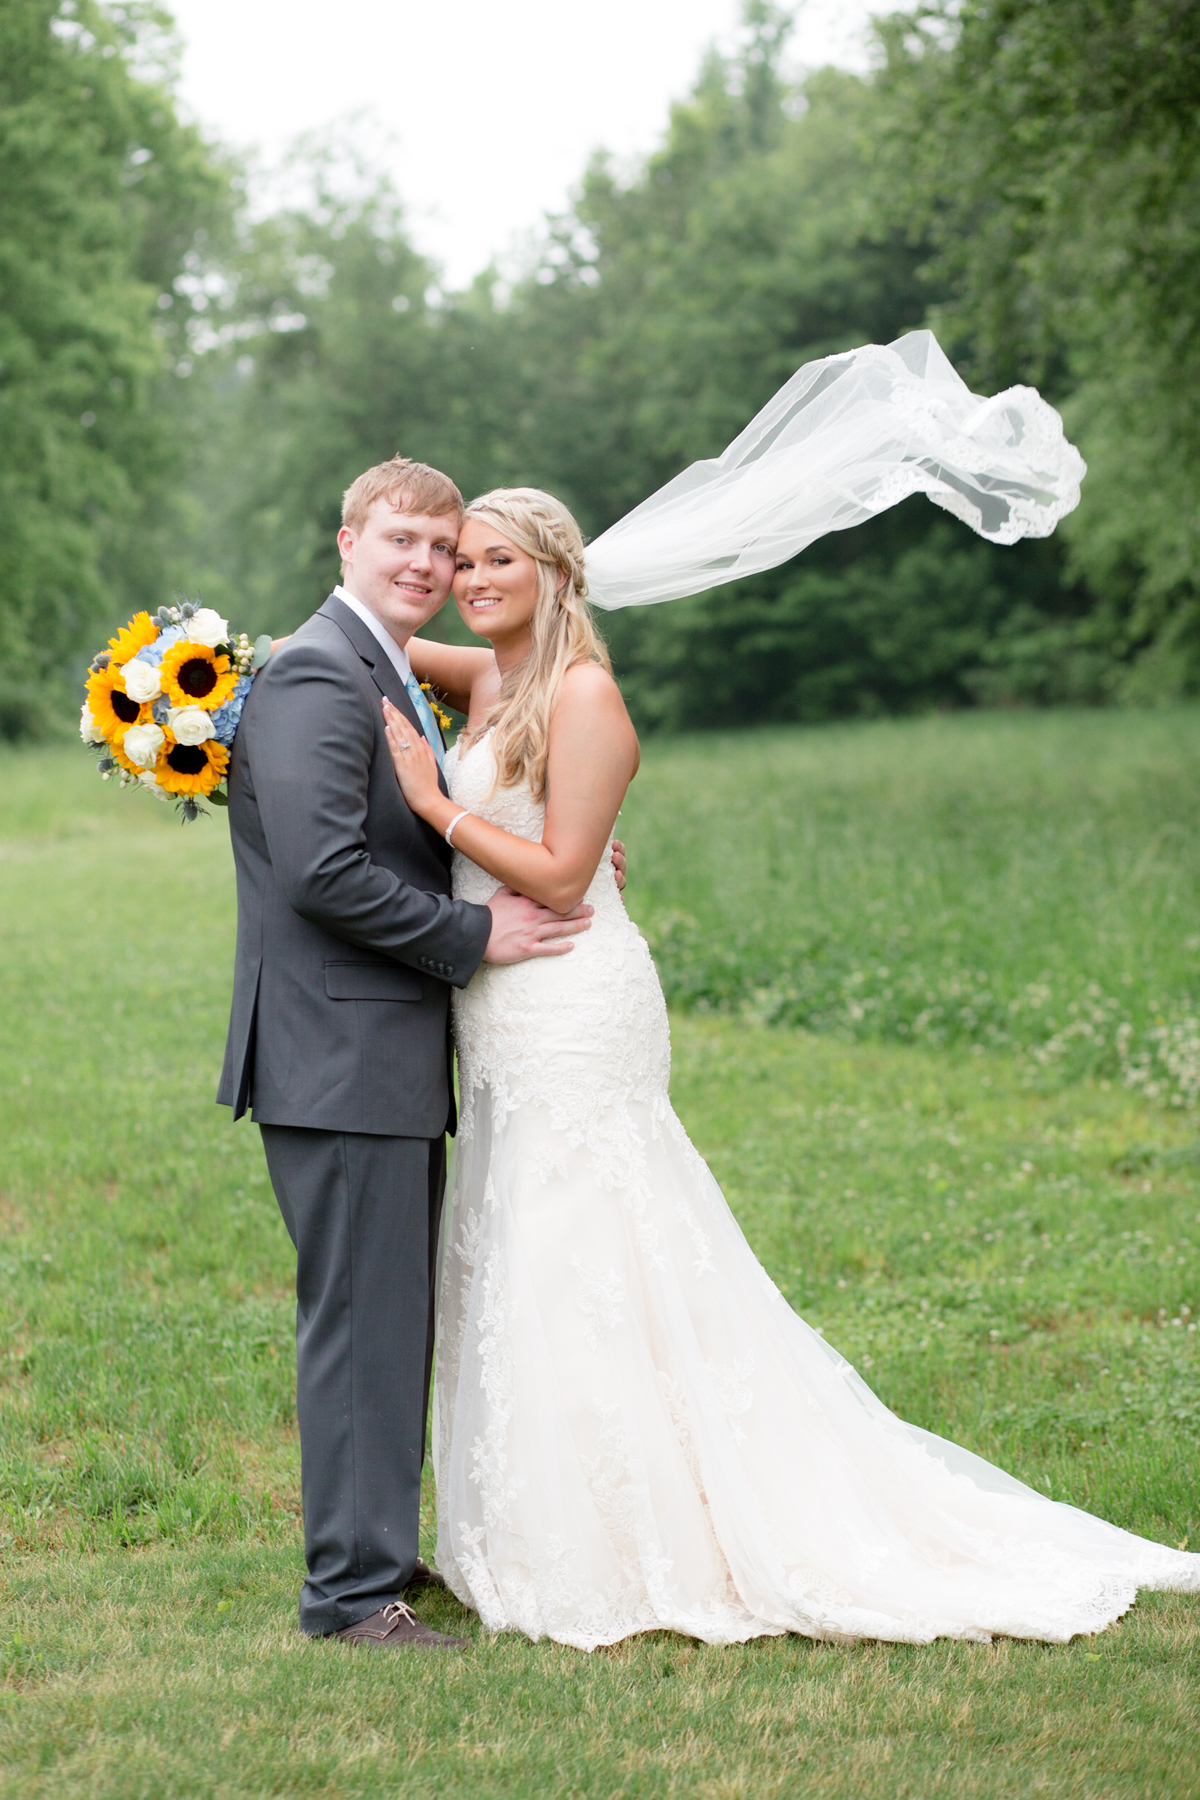 The-venue-at-white-oak-farms-wedding-nashville-wedding-photographers-0294.jpg